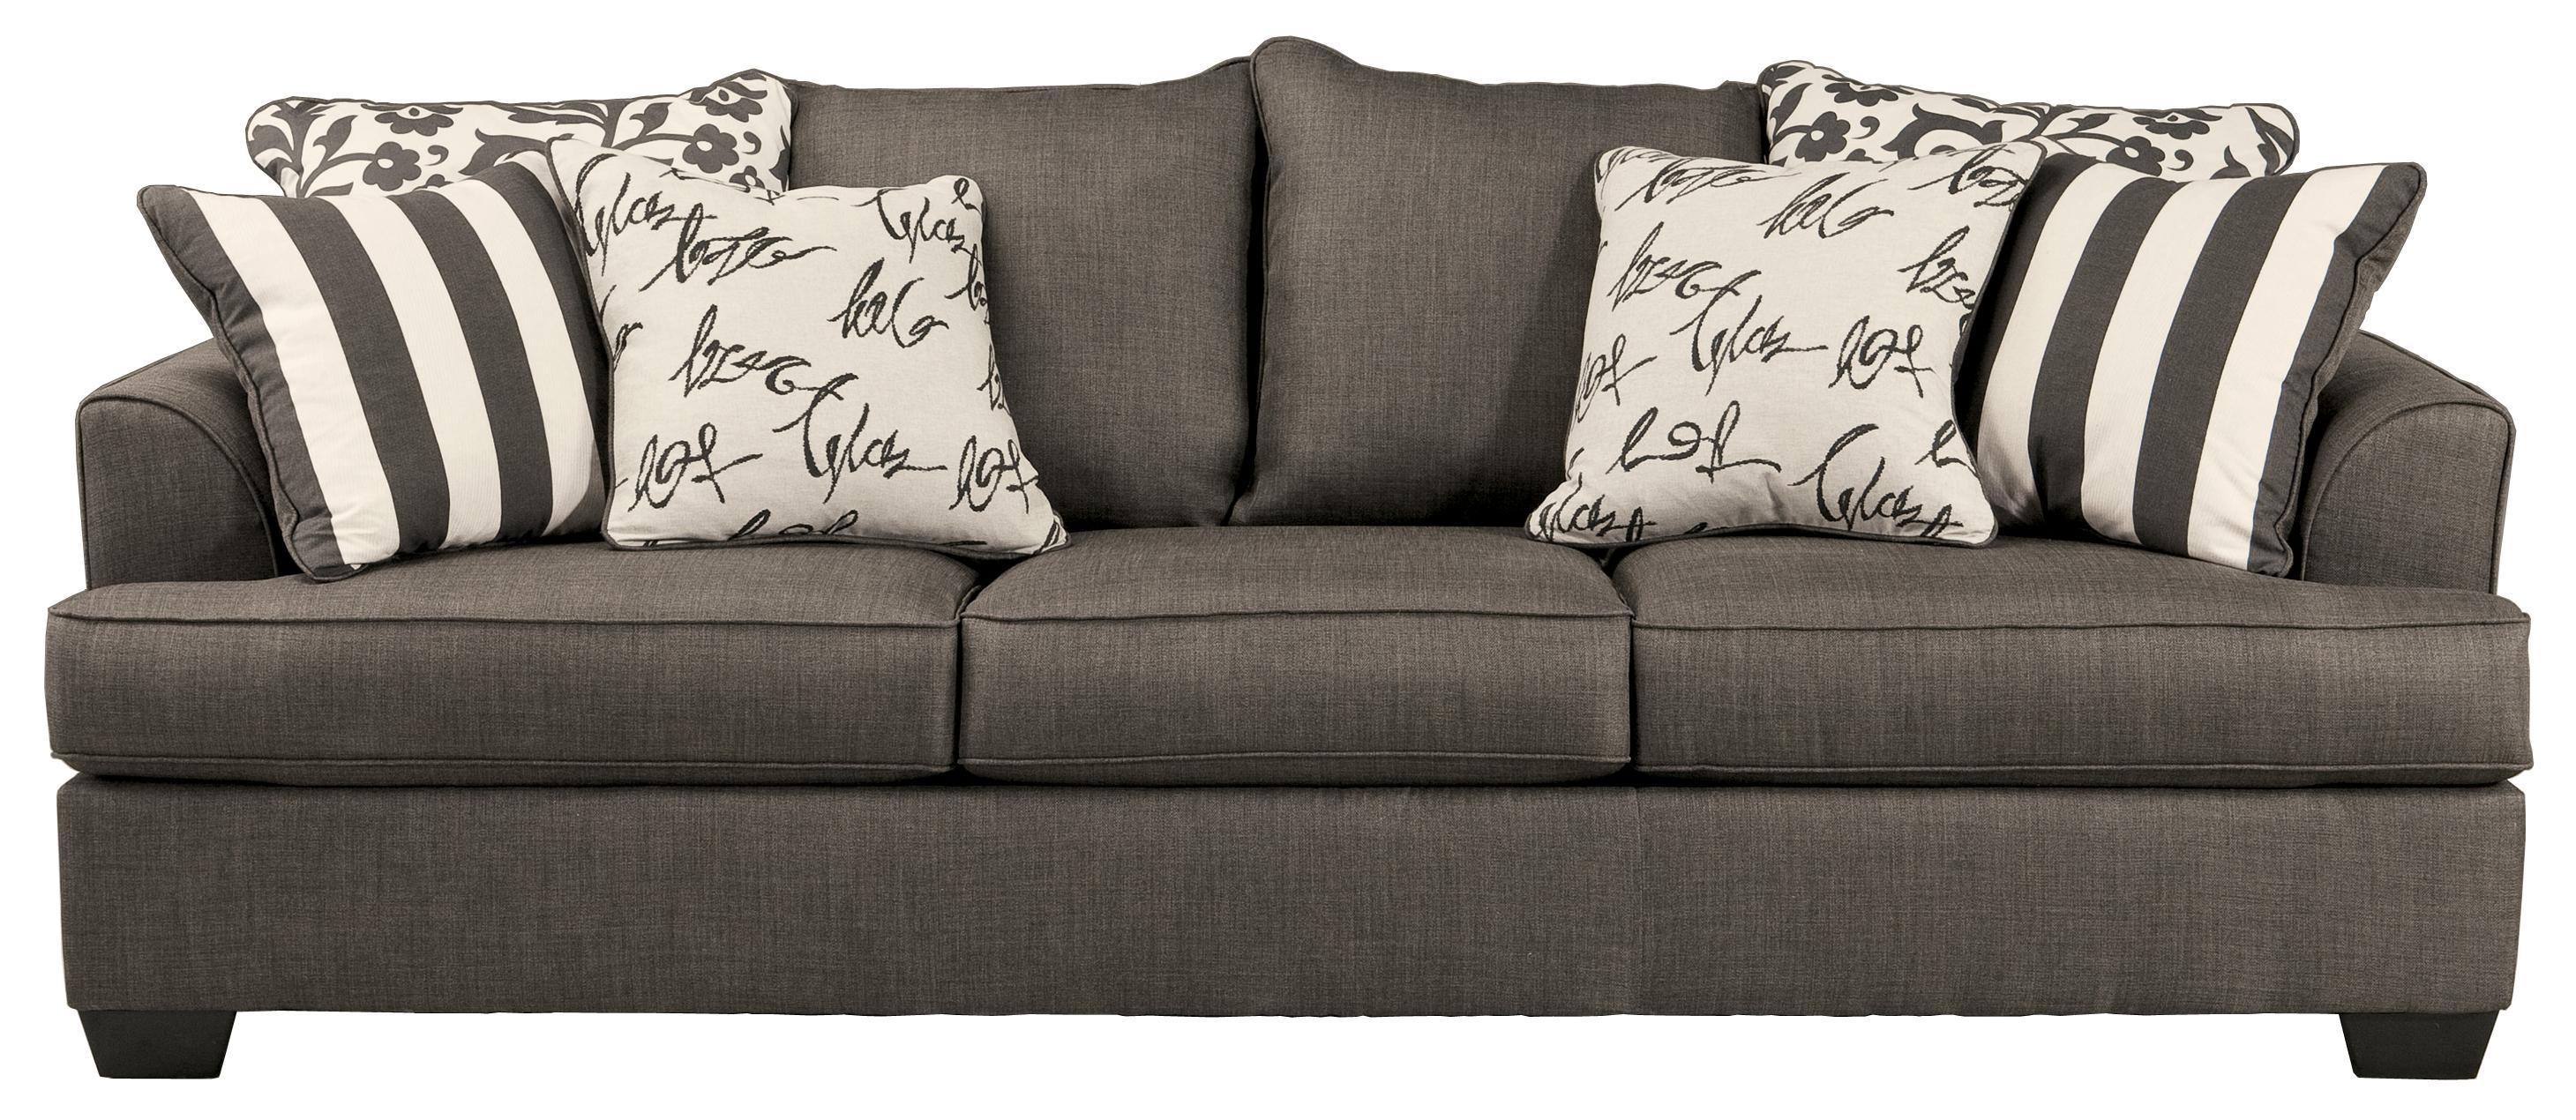 Signature Design By Ashley Levon   CharcoalQueen Sofa Sleeper ...